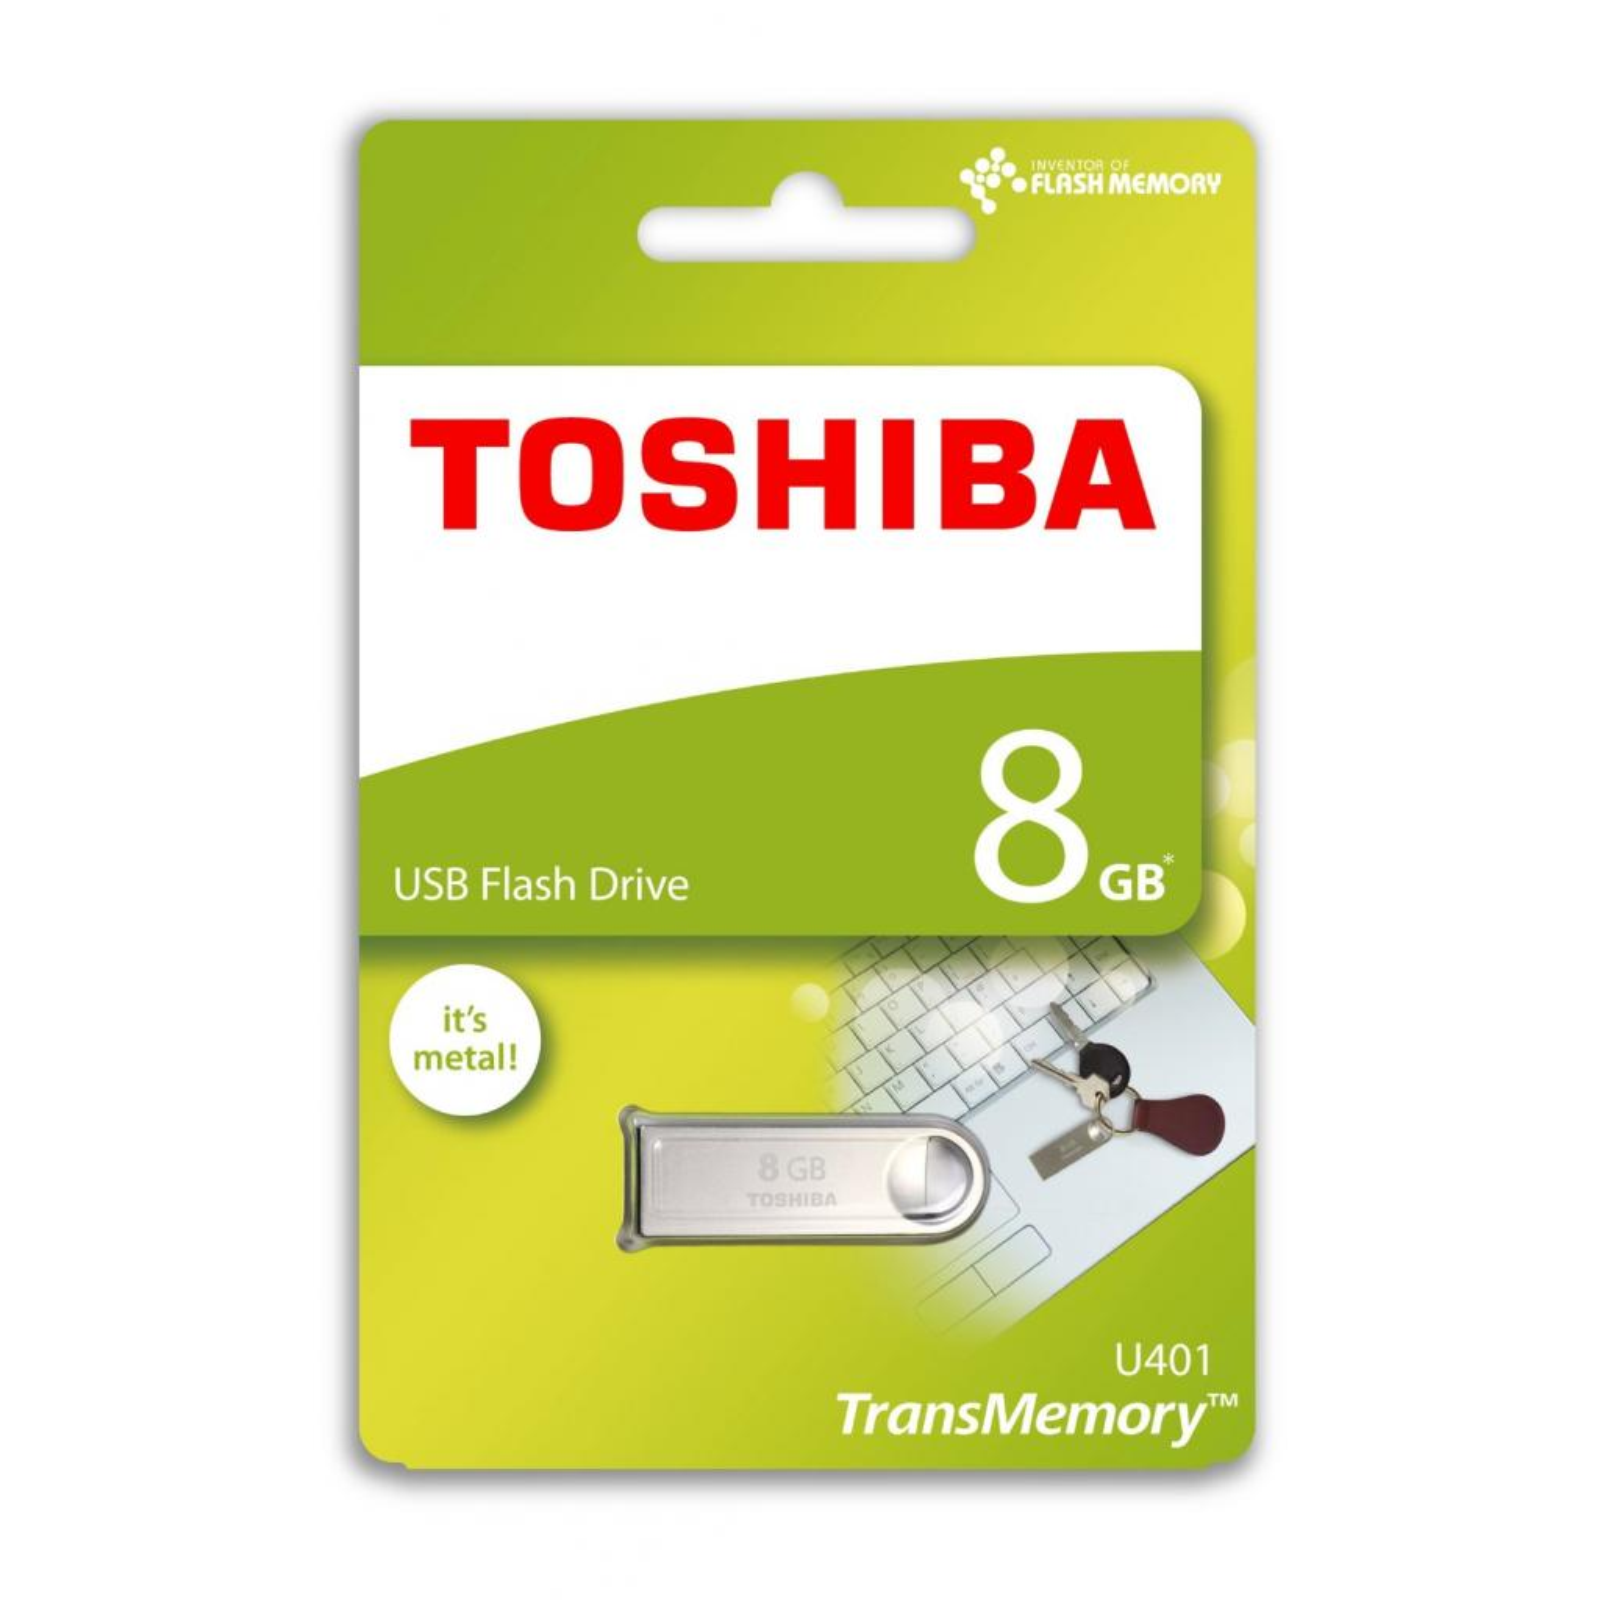 USB флеш накопитель TOSHIBA 8GB Owari Metal USB 2.0 (THN-U401S0080E4) изображение 5